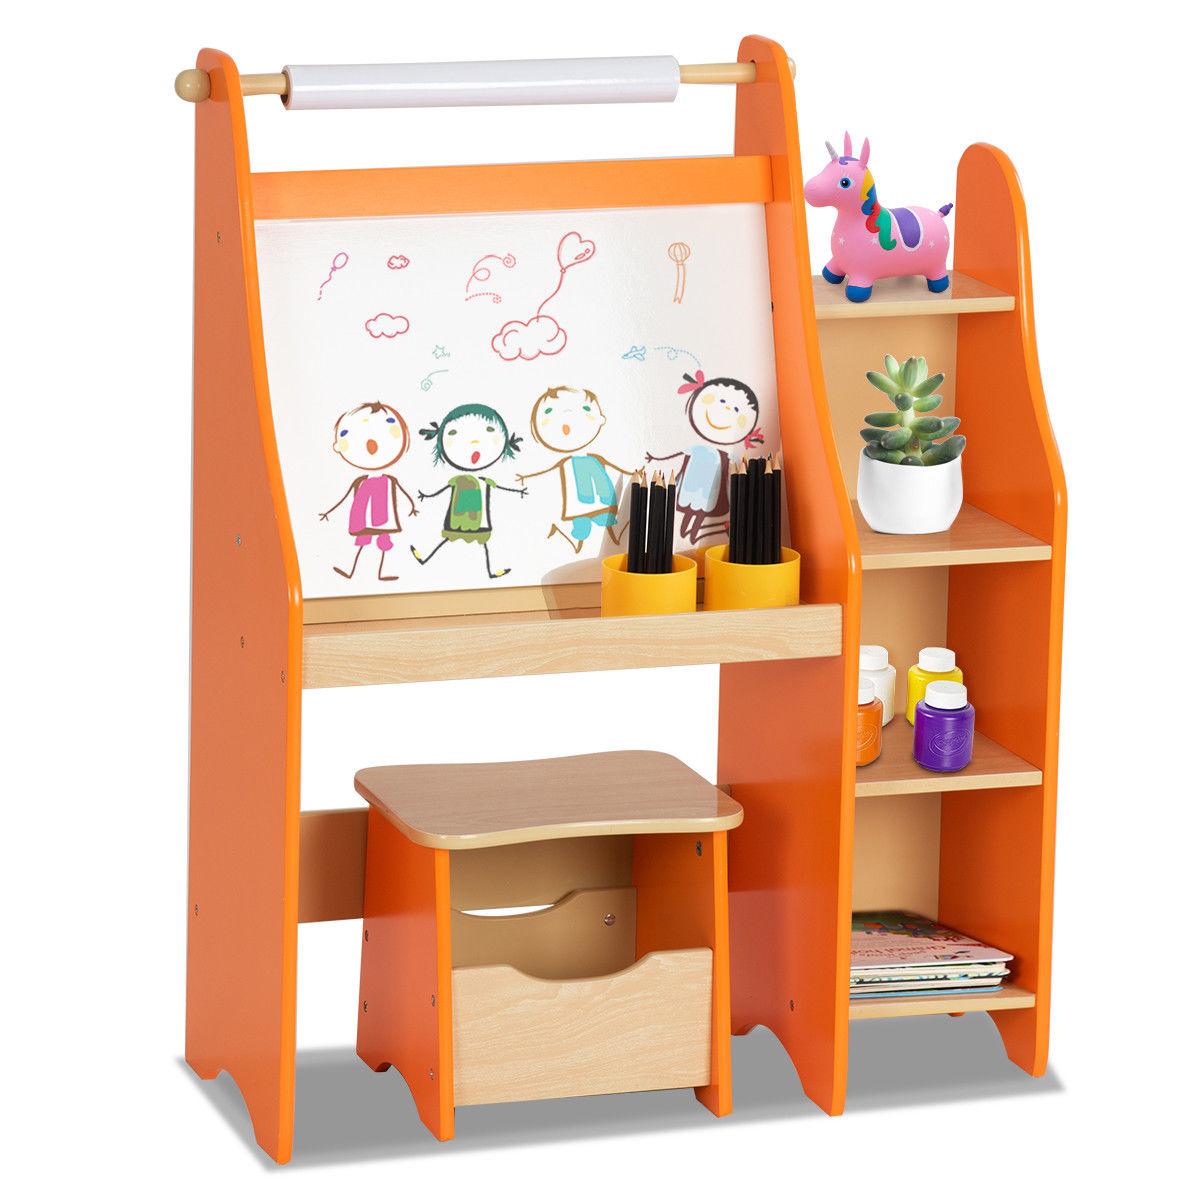 Goplus Kids Art Master Drawing Desk Easel Artist Activity Storage W/ Stool Studio Set